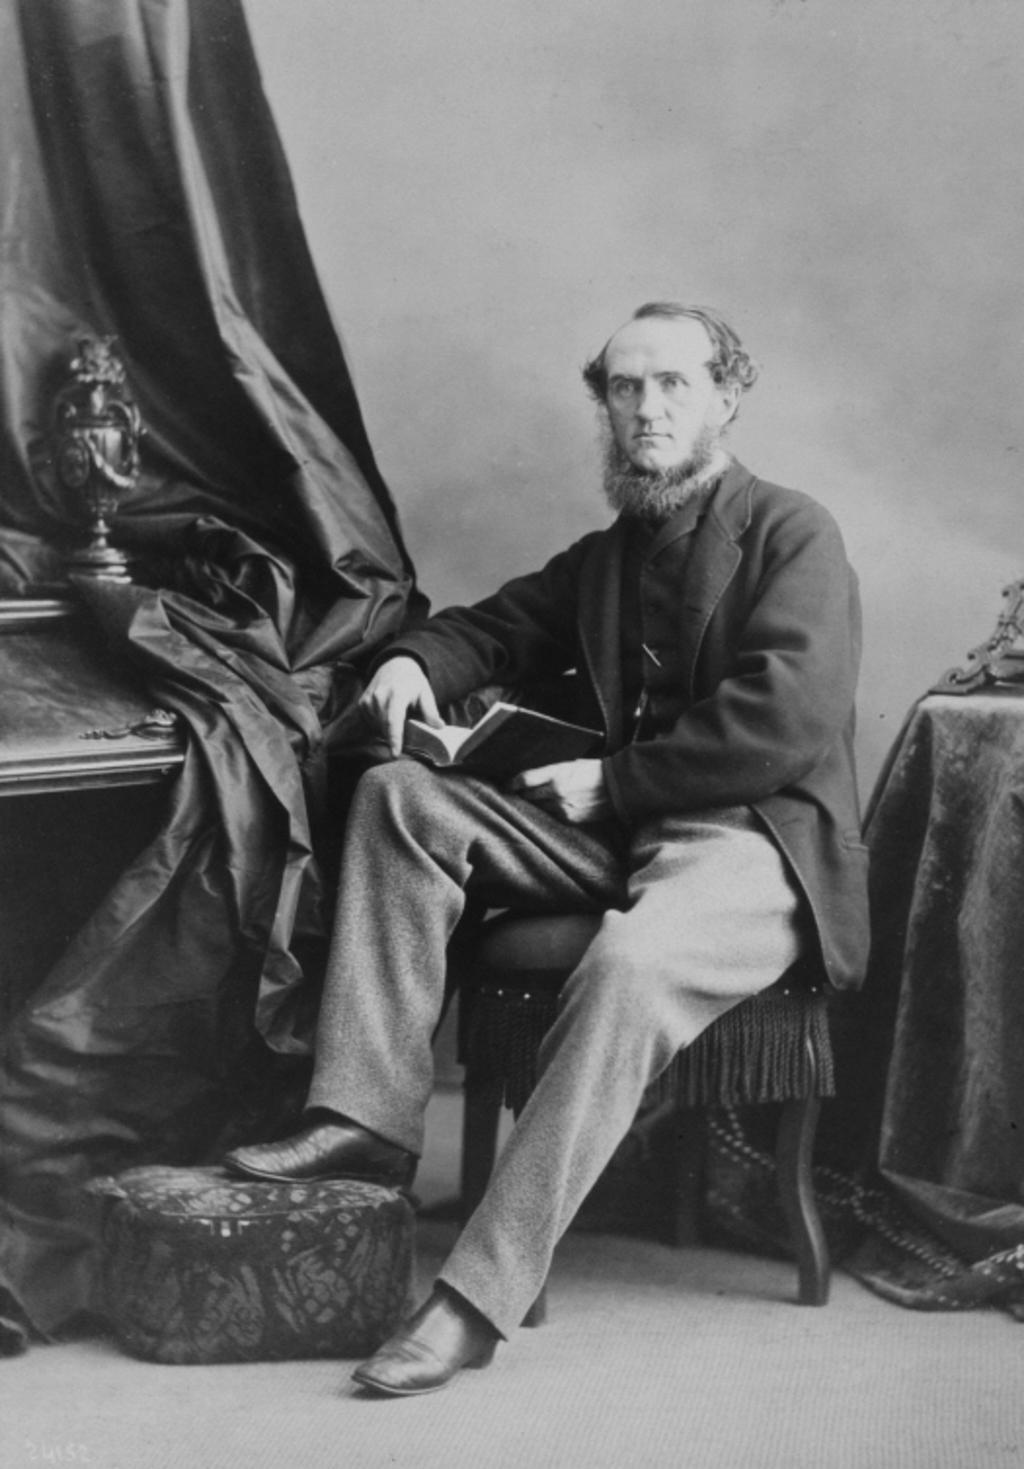 Notman, William